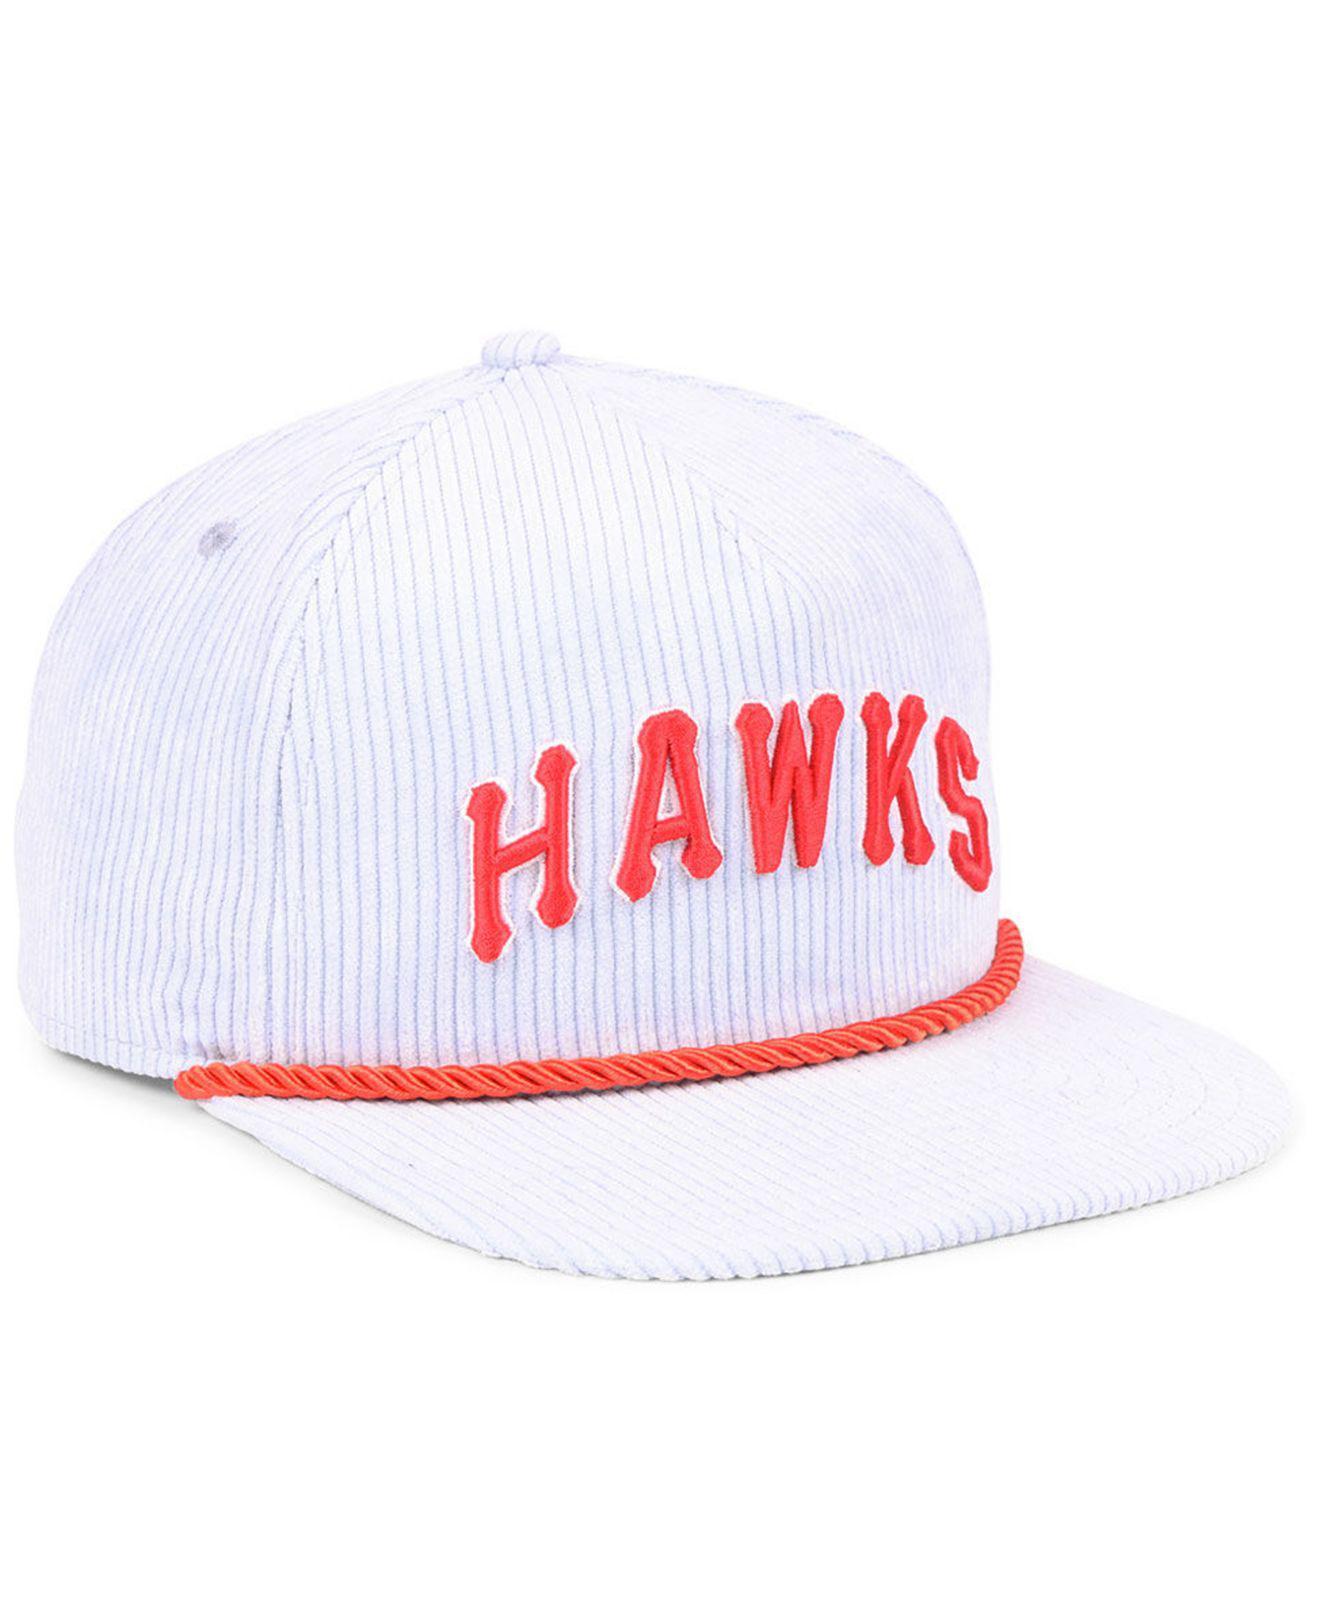 KTZ - Multicolor Atlanta Hawks Hardwood Classic Nights Cords 9fifty  Snapback Cap for Men - Lyst. View fullscreen eaf78db0a